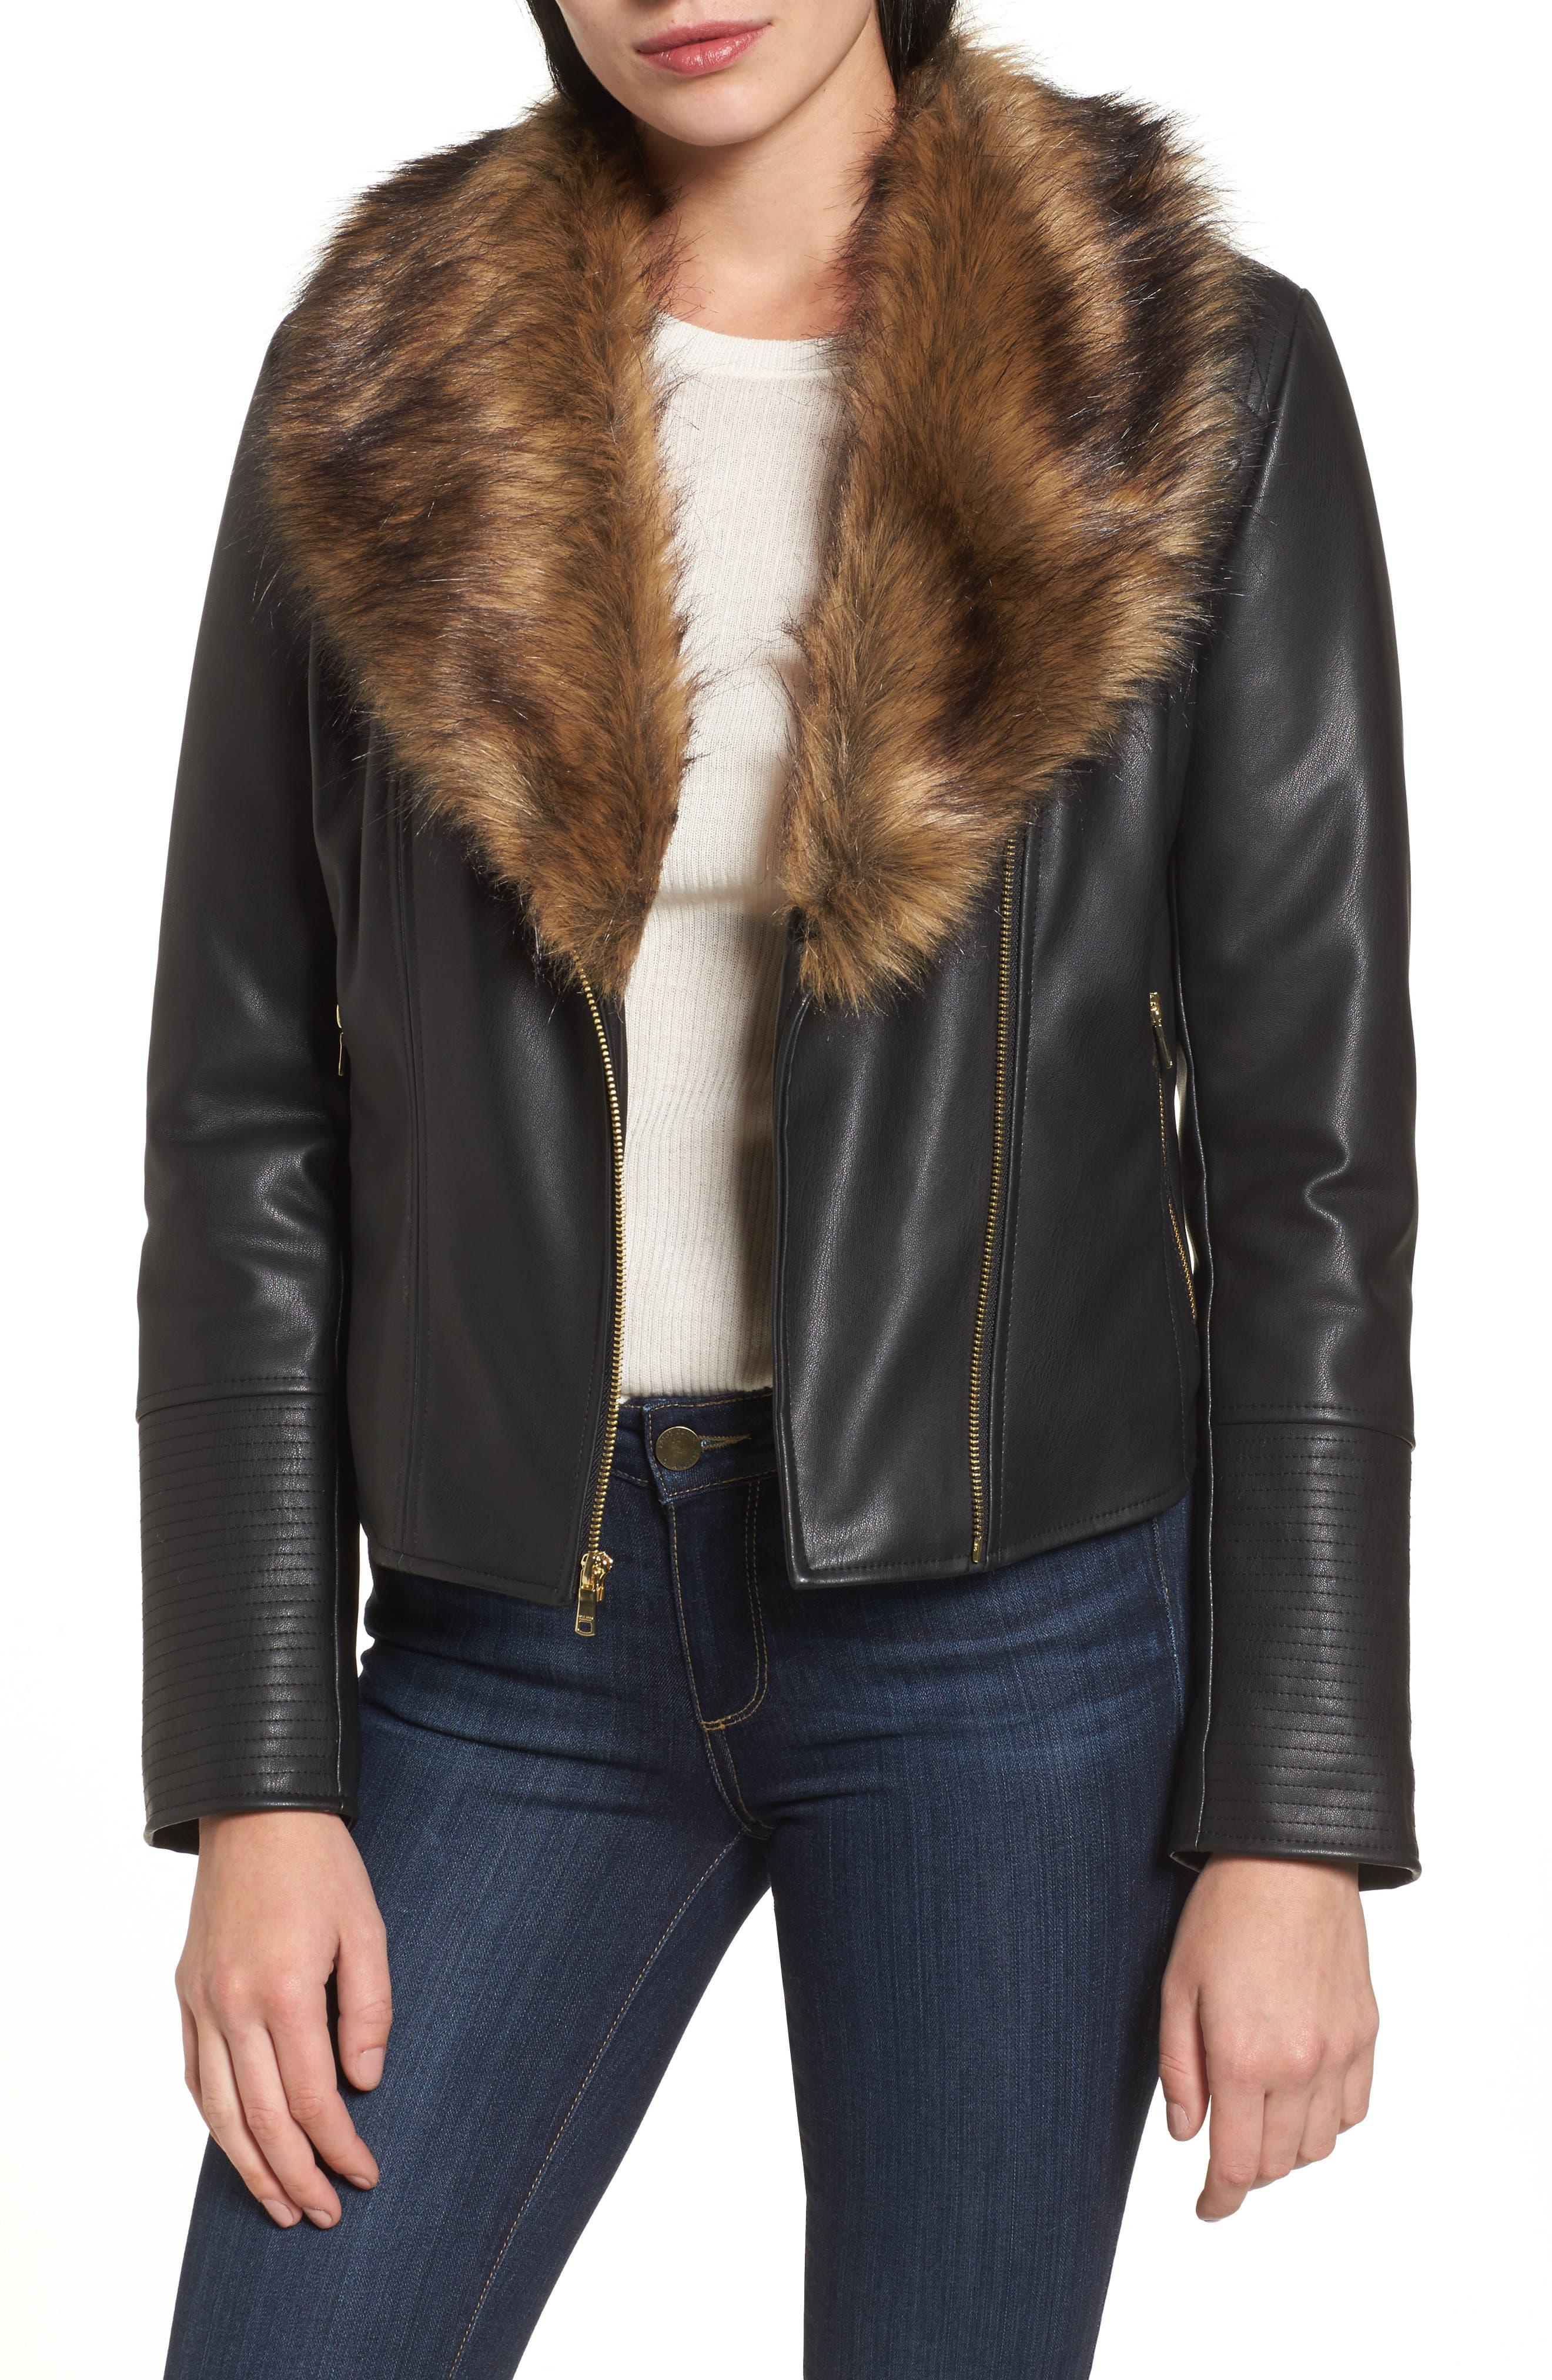 COLE HAAN SIGNATURE Faux Leather Jacket with Detachable Faux Fur